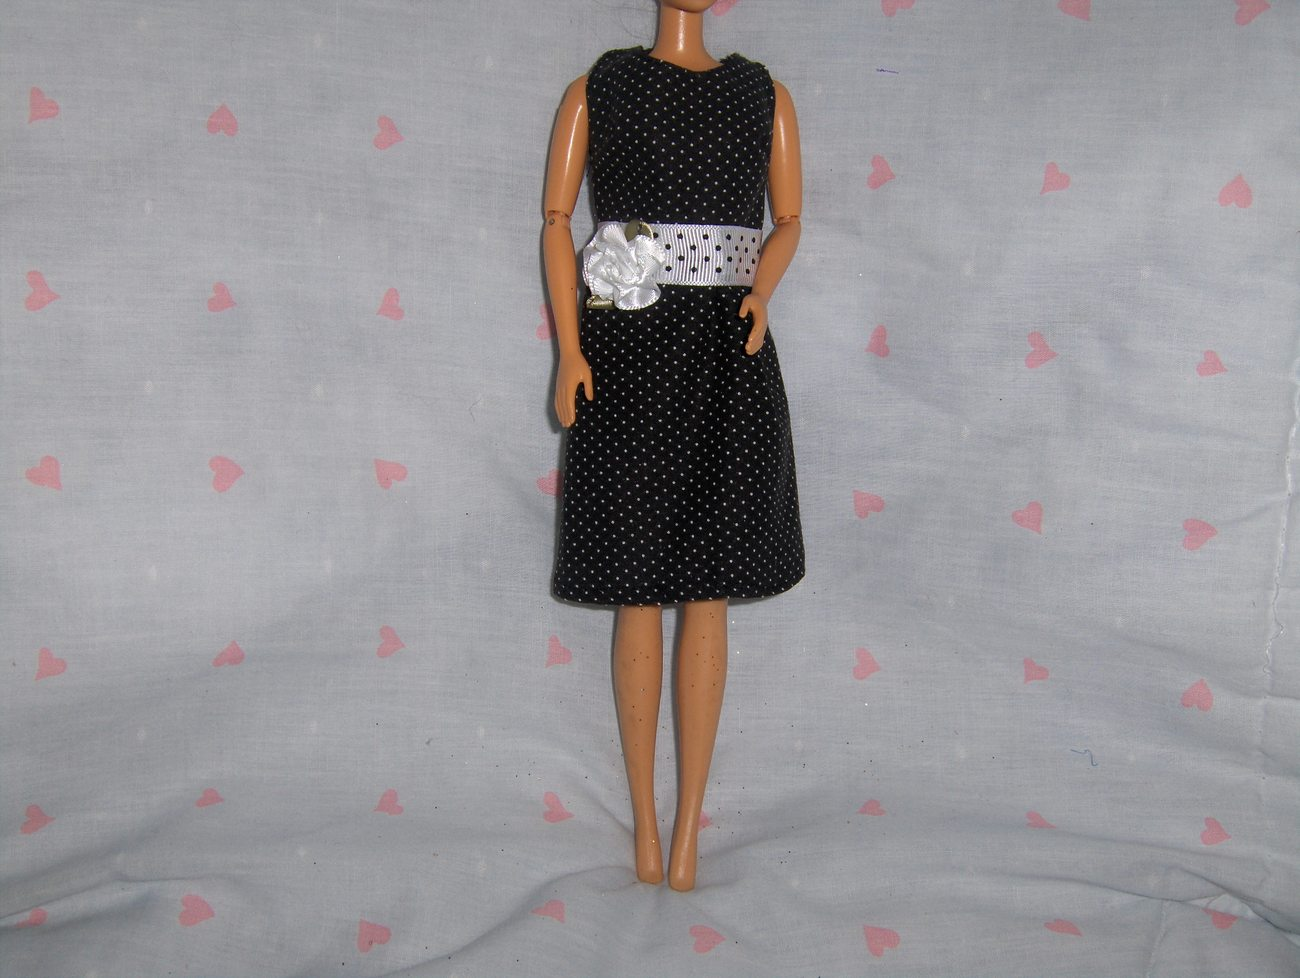 Black Polka Dot Dress/ White Polka Dot Belt and Satin Flower Accent fits Barbie